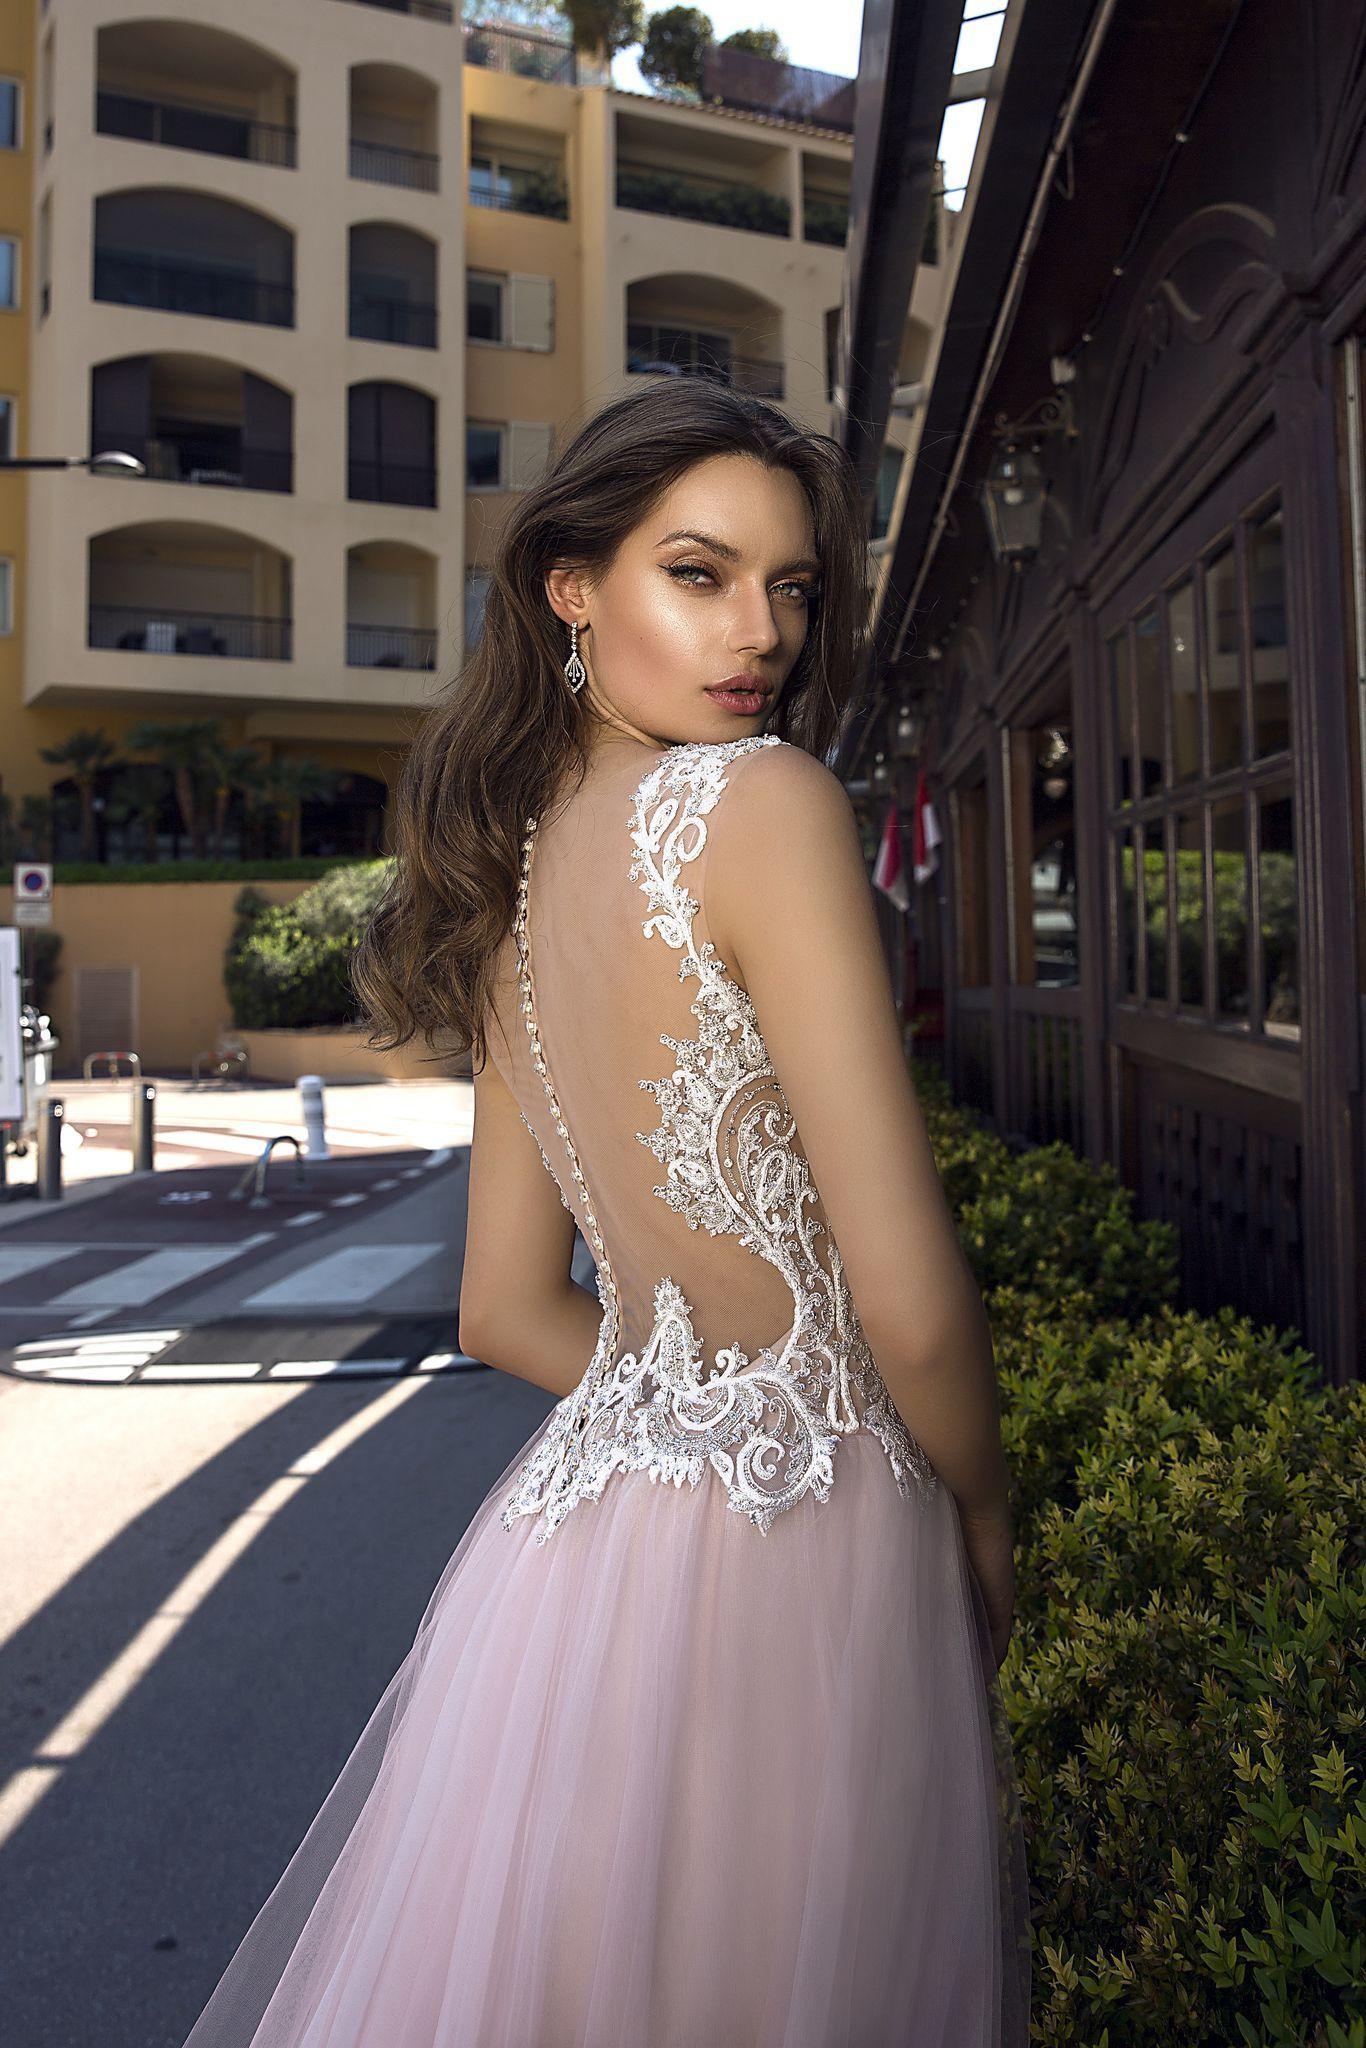 Dress for wedding engagement party  wedding dress Federica Каталог страница товара u Tina Valerdi